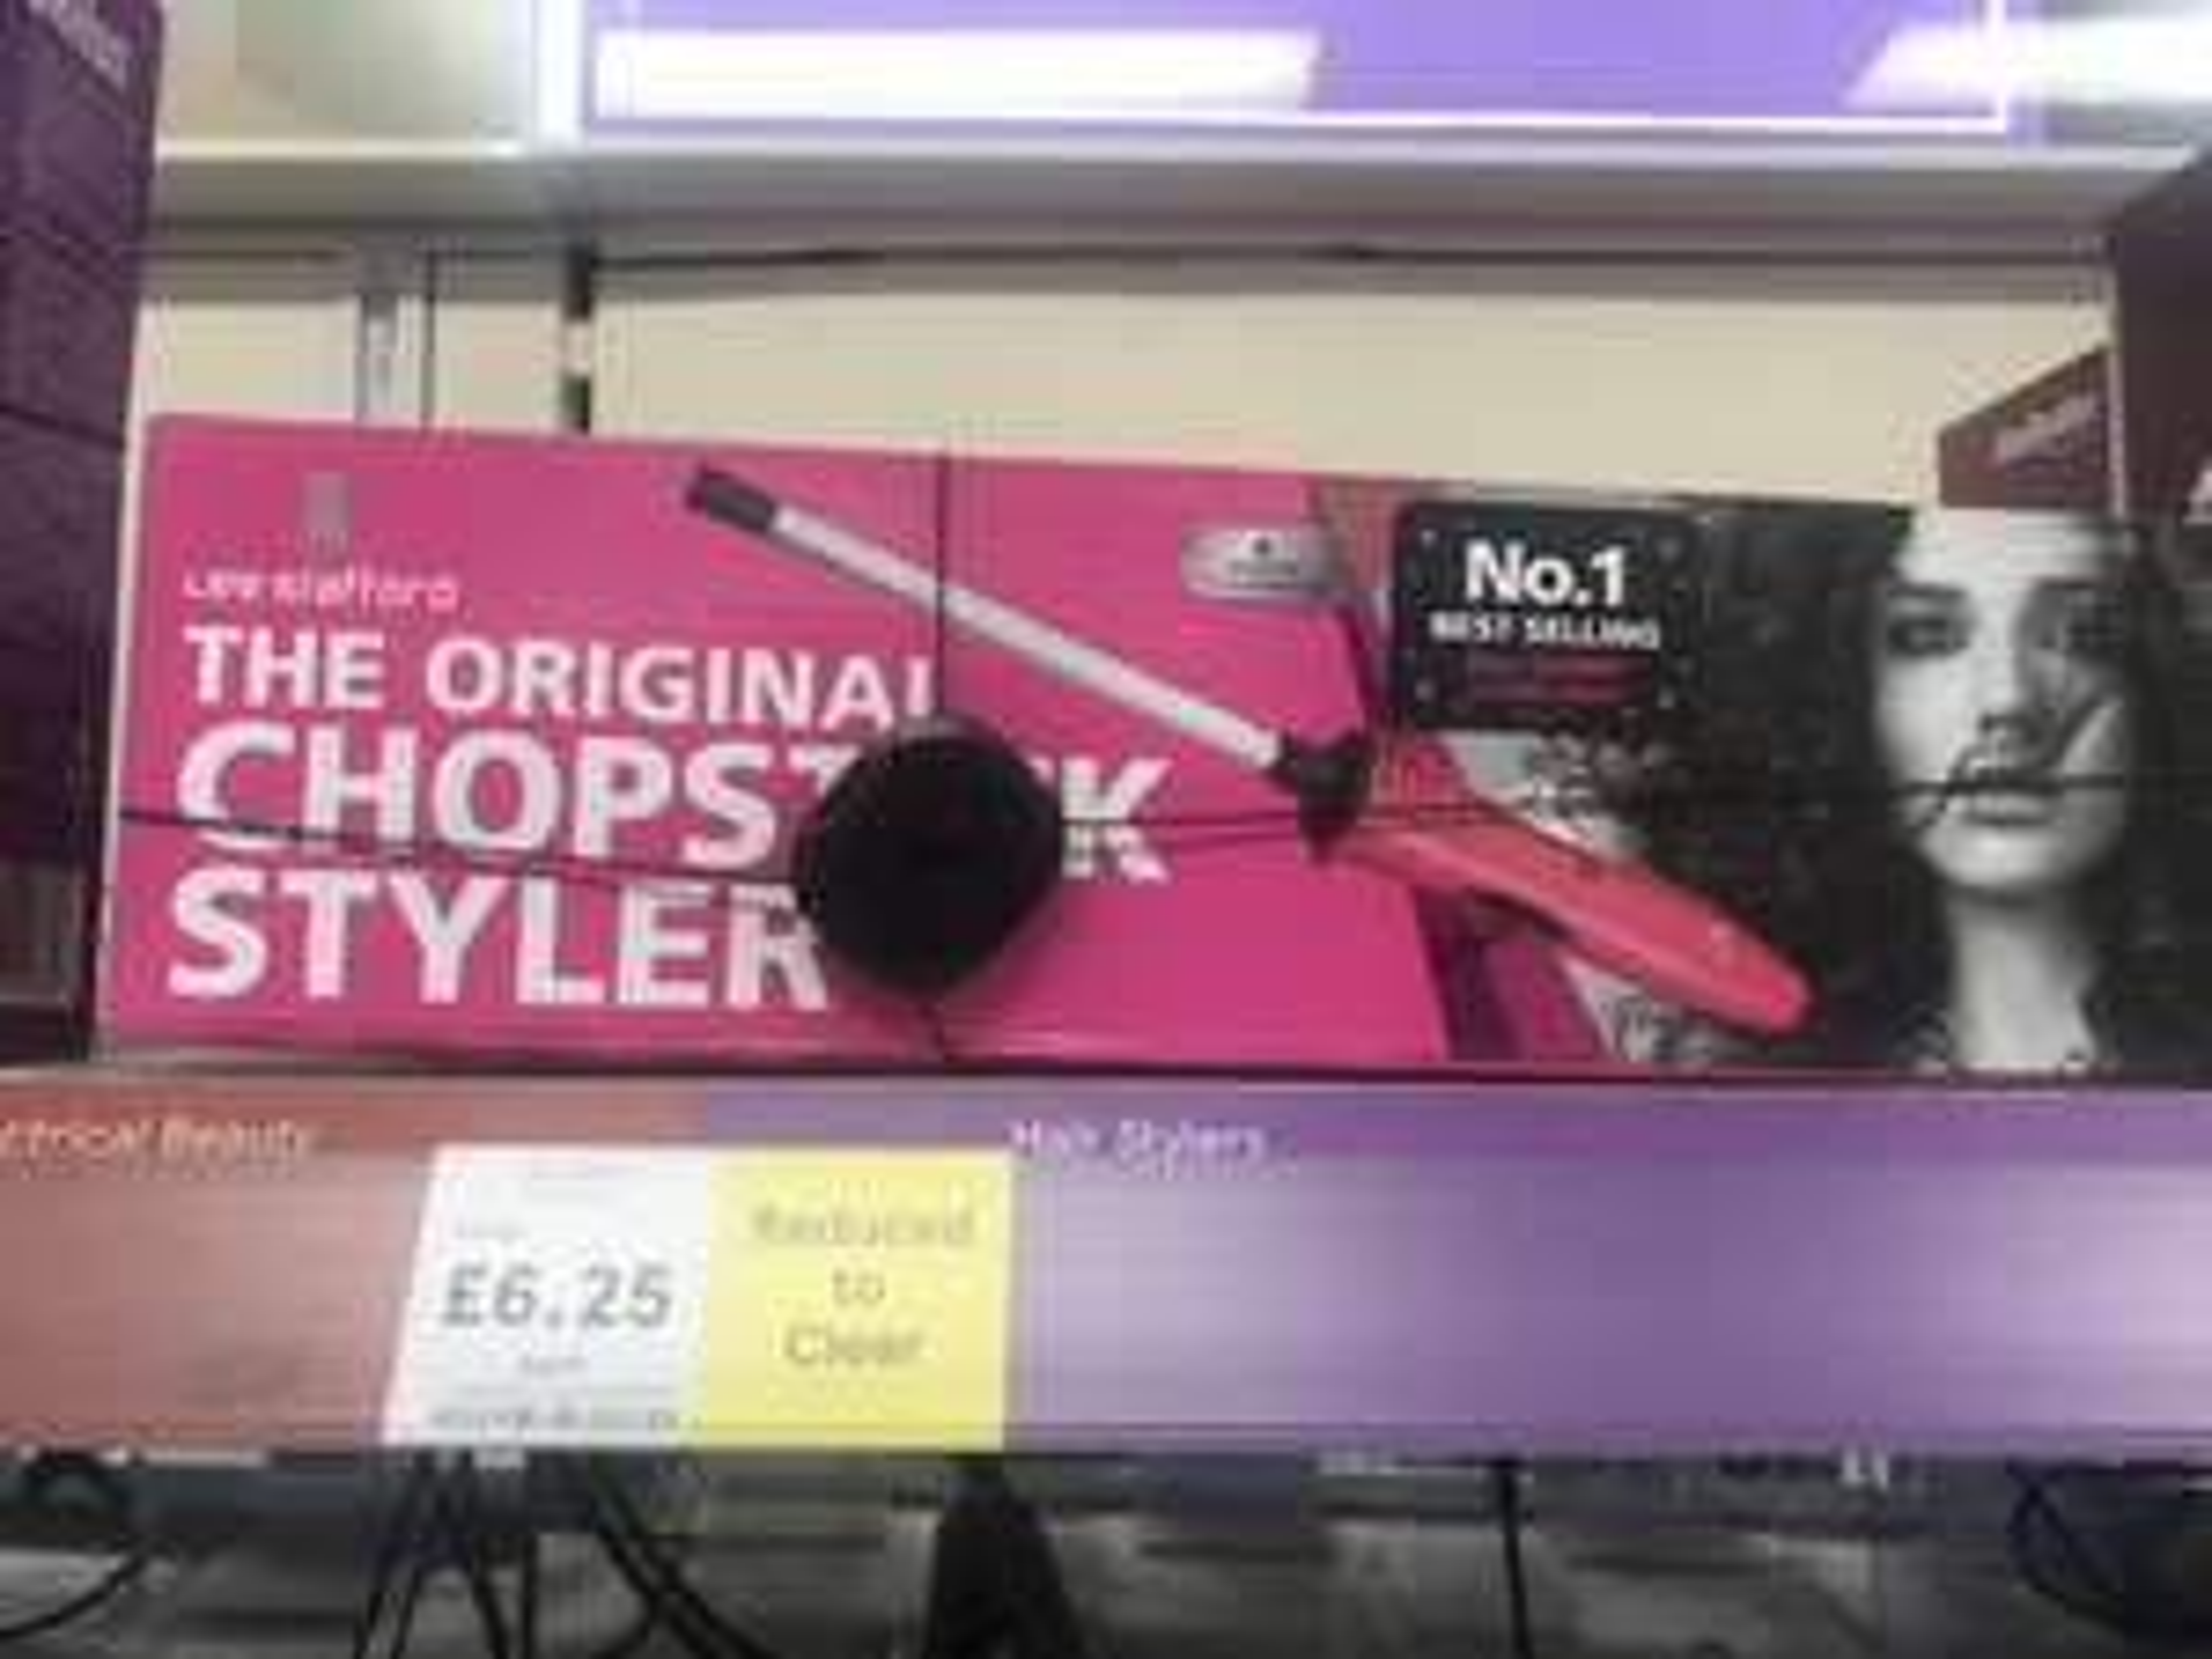 Lee Stafford Chopstick hair styler!  instore at Tesco £6.25!